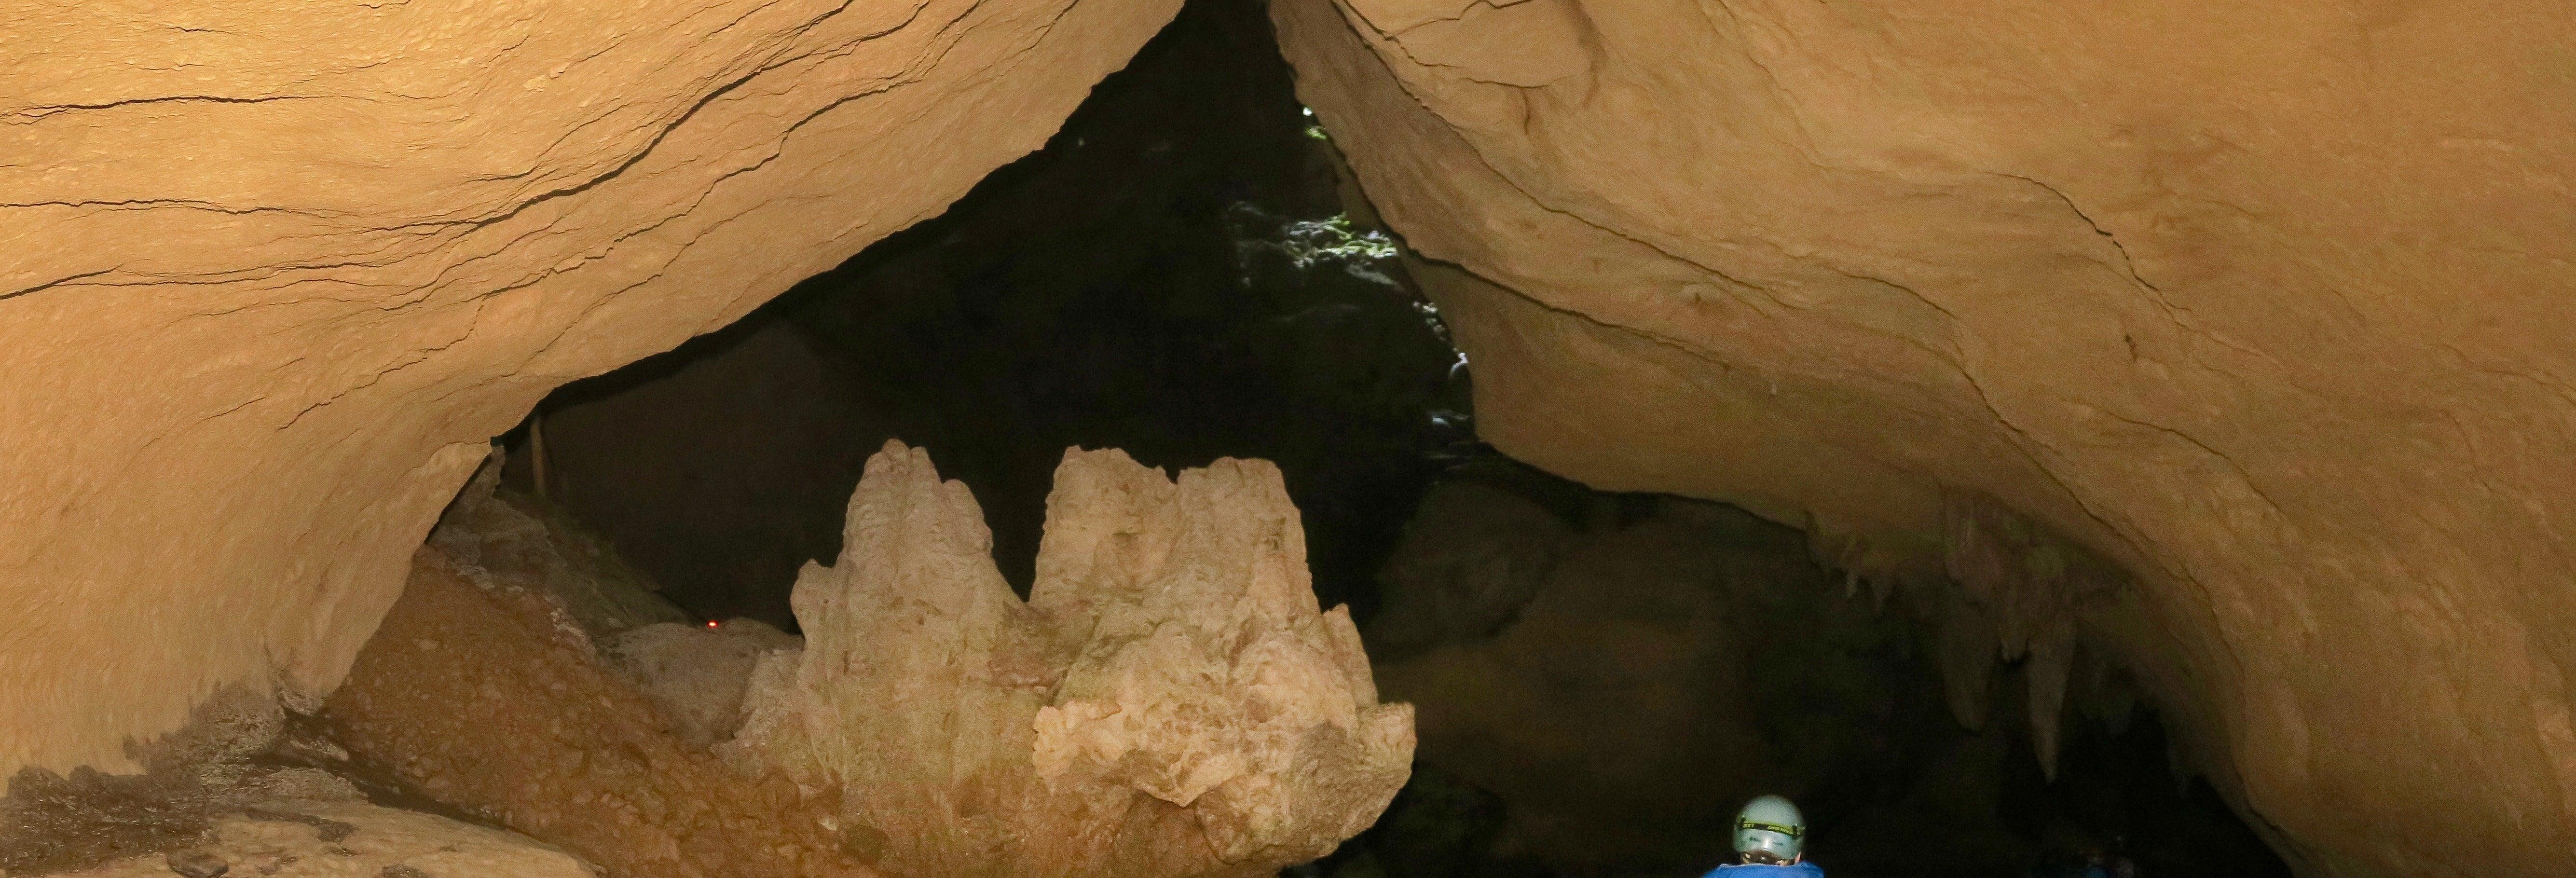 Tirolina y cave tubing en el Parque Jaguar Paw para cruceros